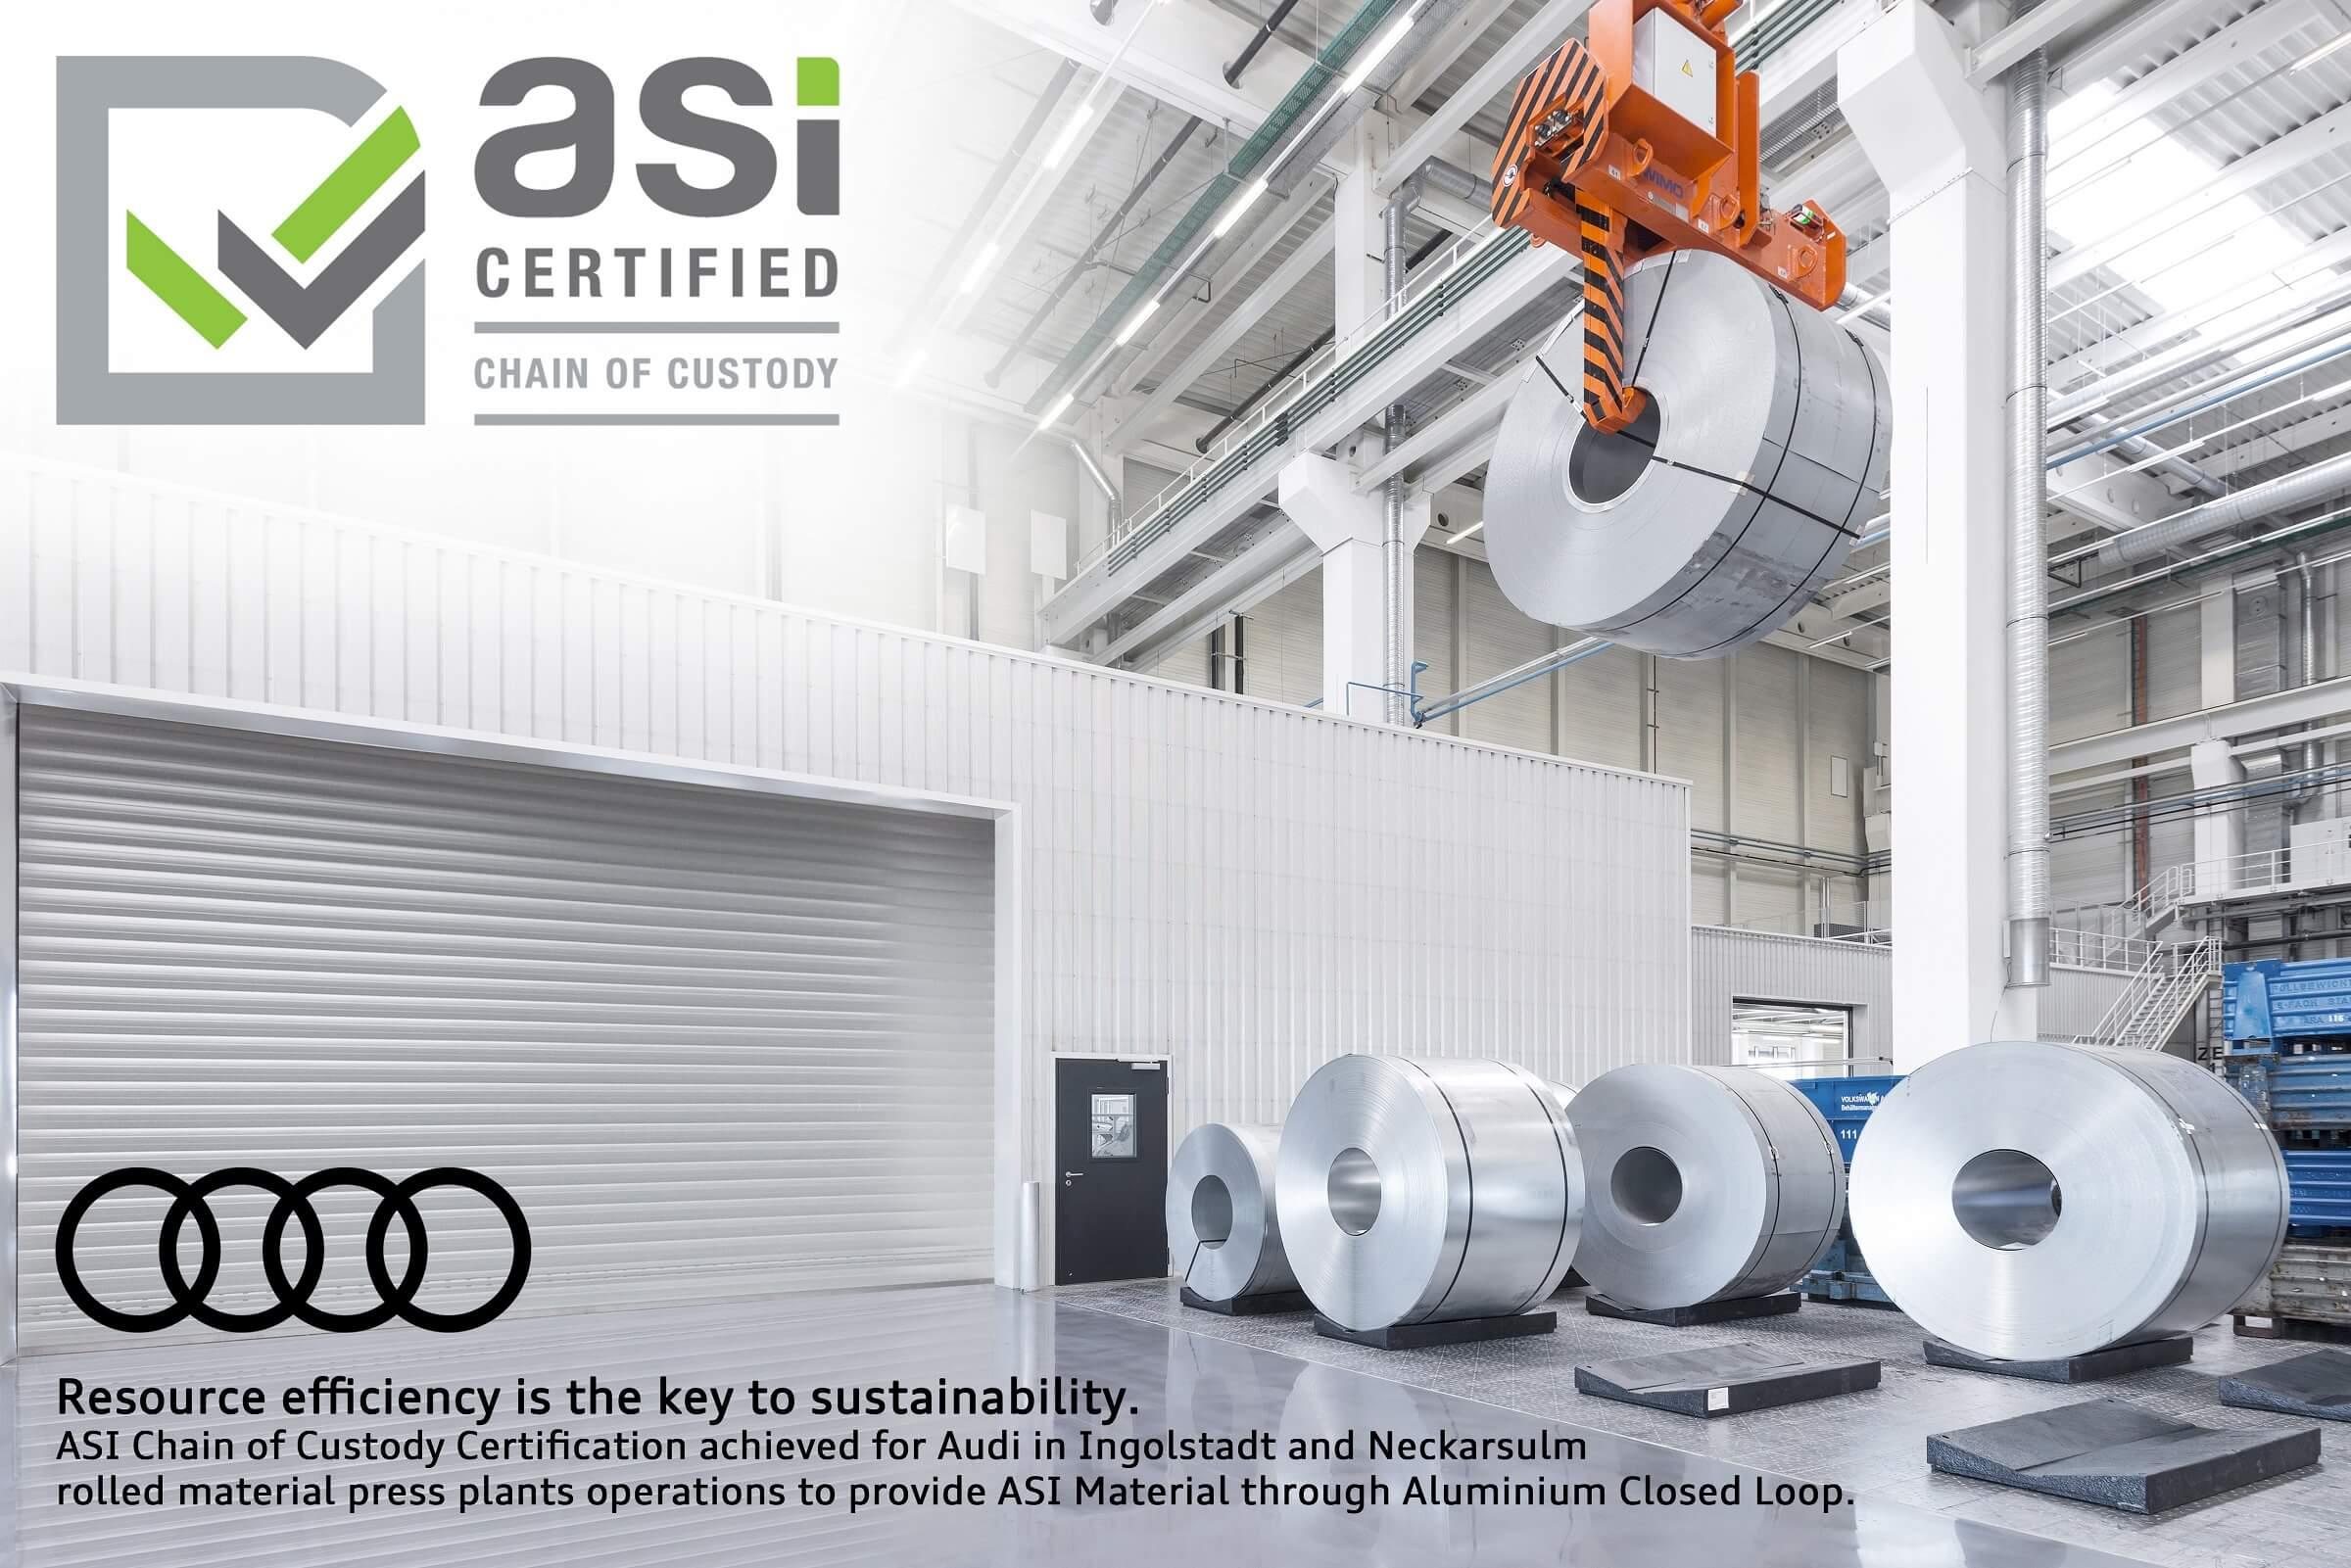 AUDI - ASI Πιστοποίηση διαχείρισης αλουμινίου